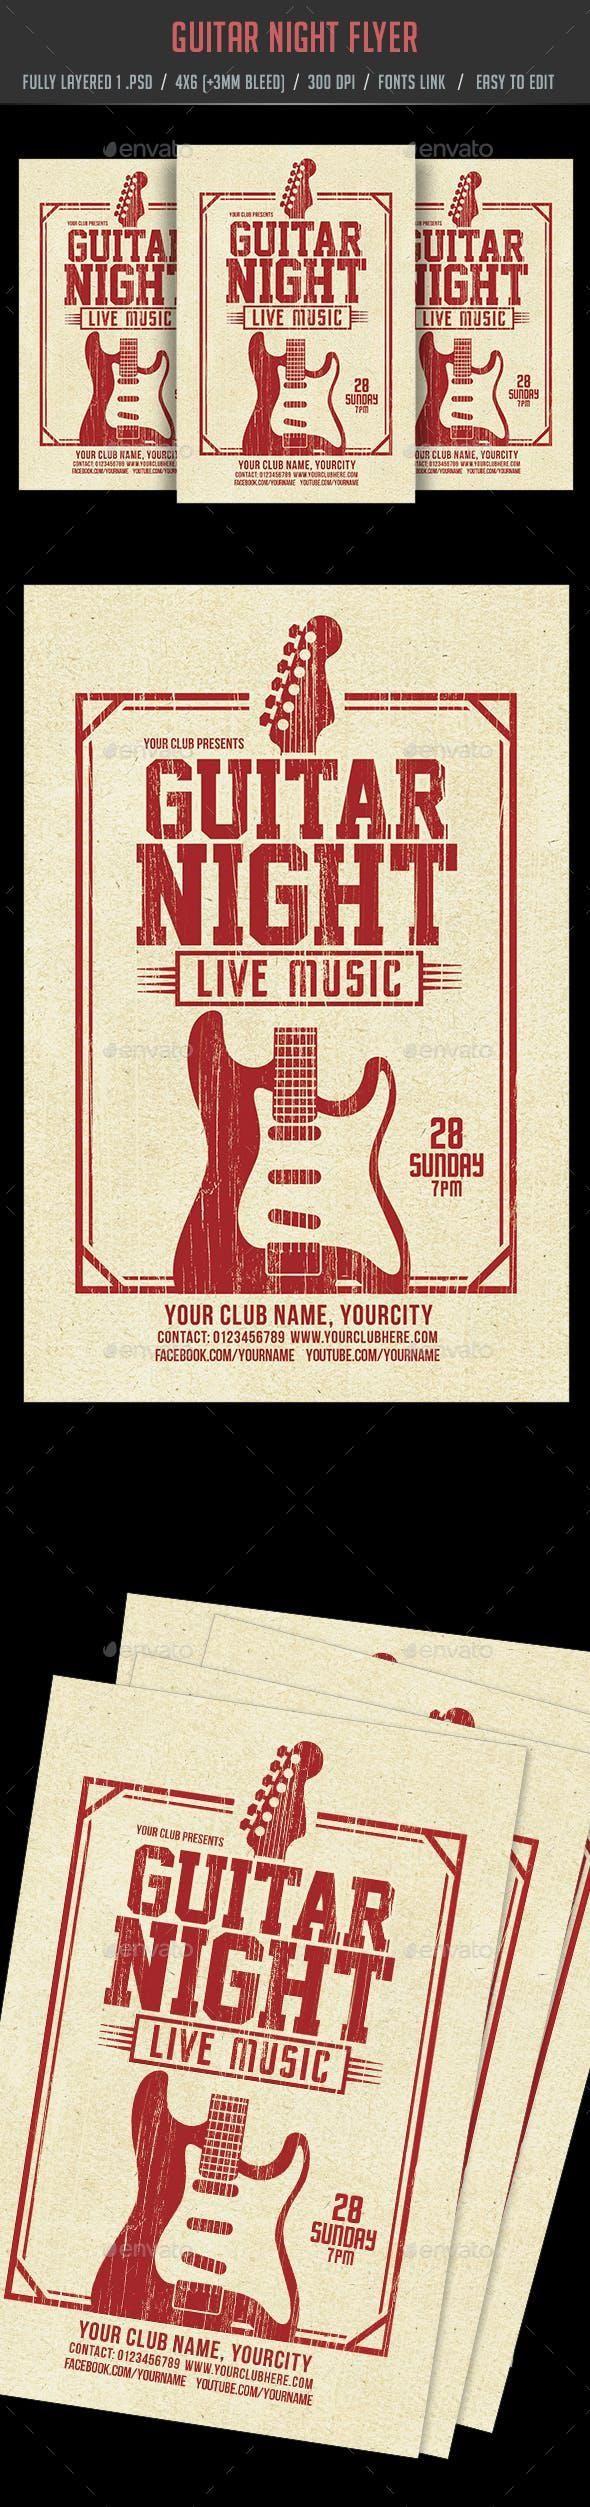 Guitar Night Flyer print FlyerTemplate graphics